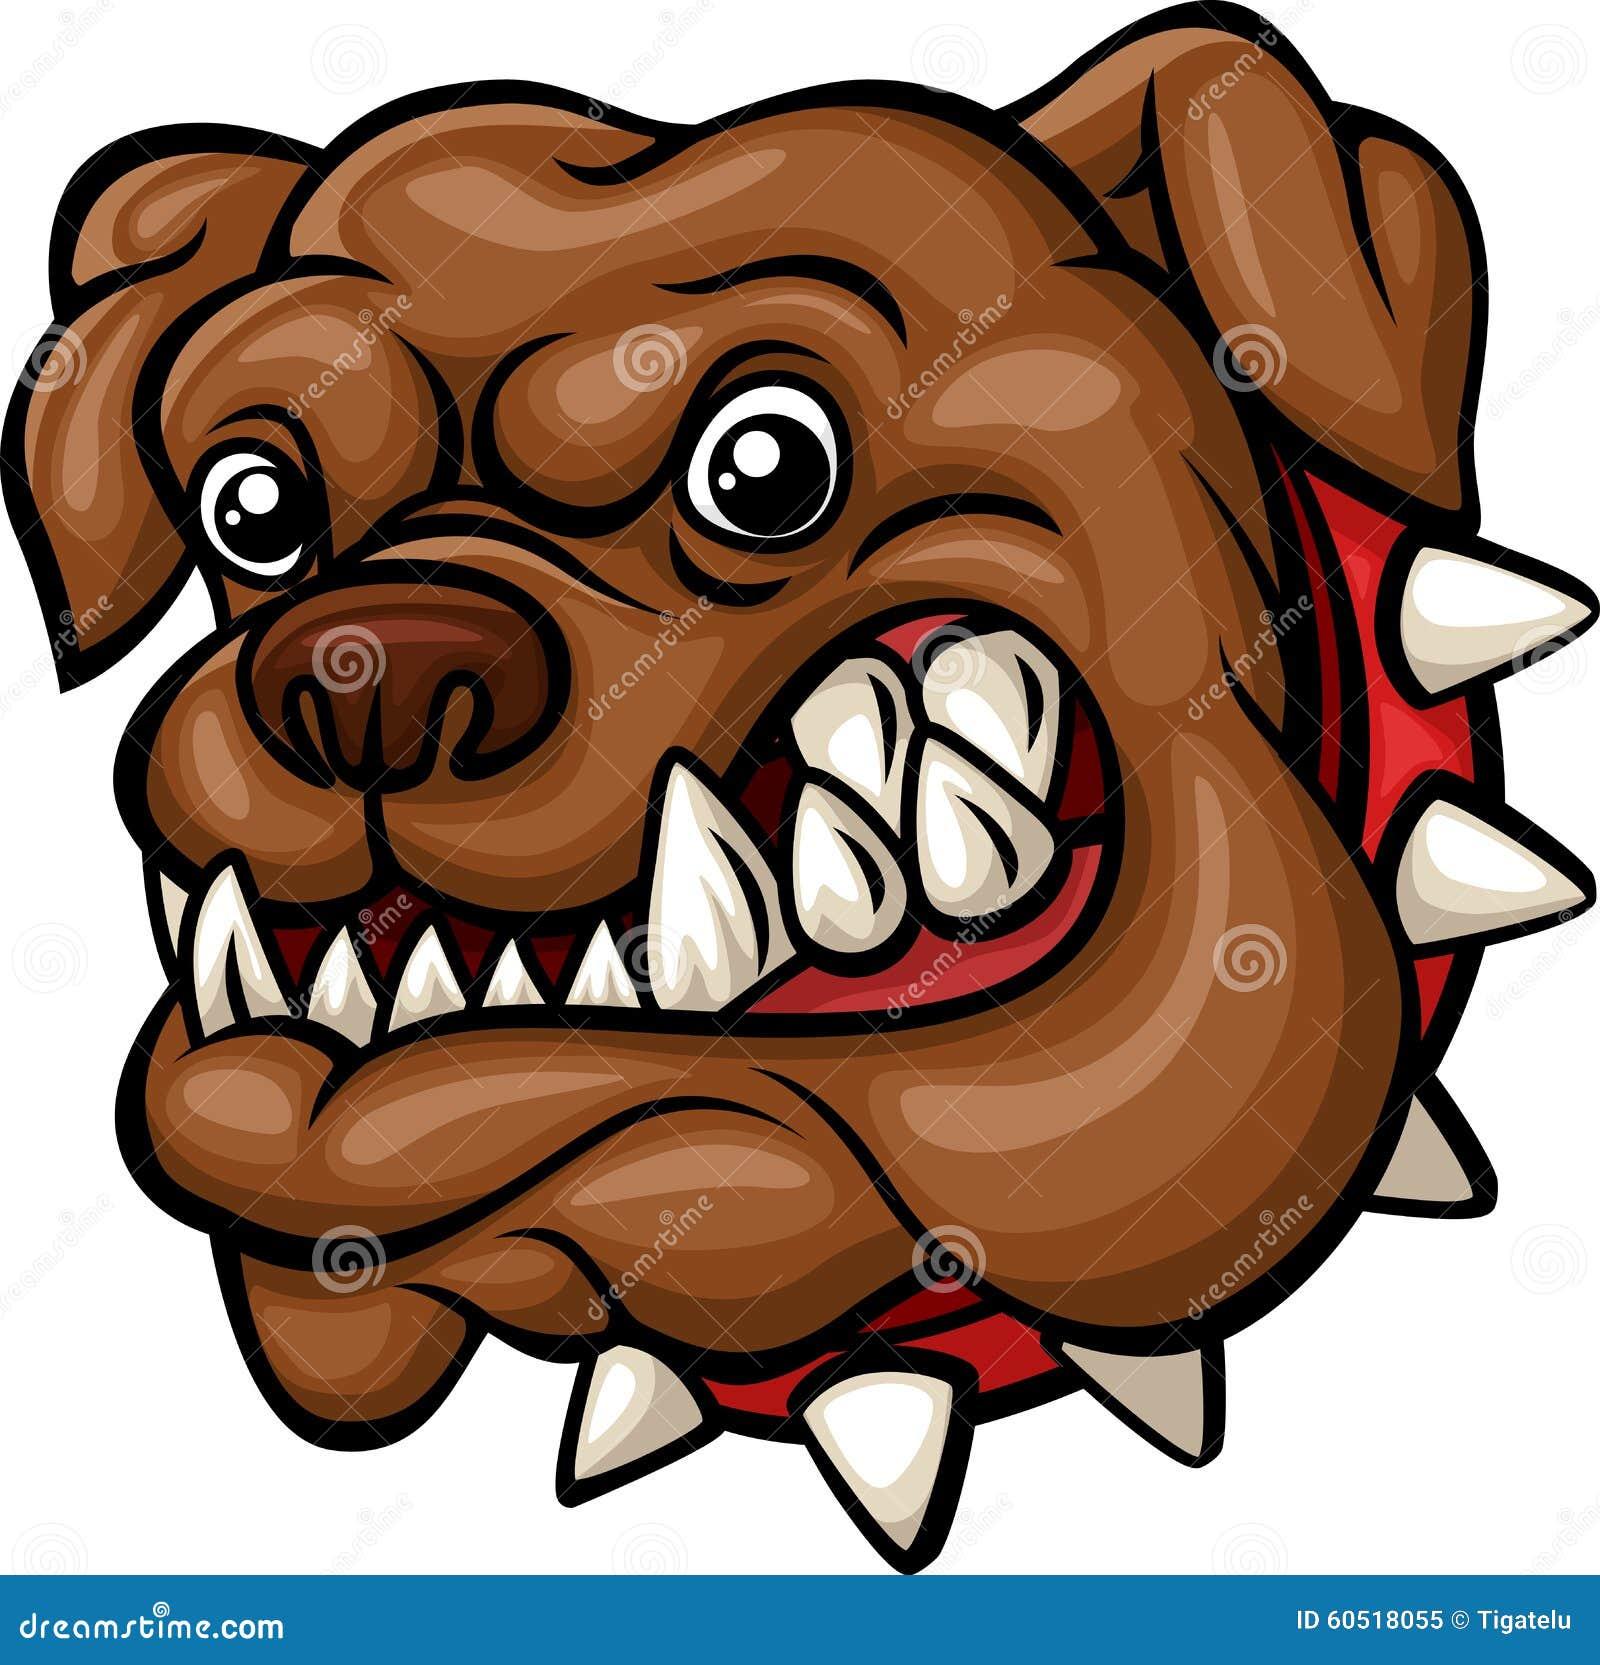 Angry cartoon bulldog face